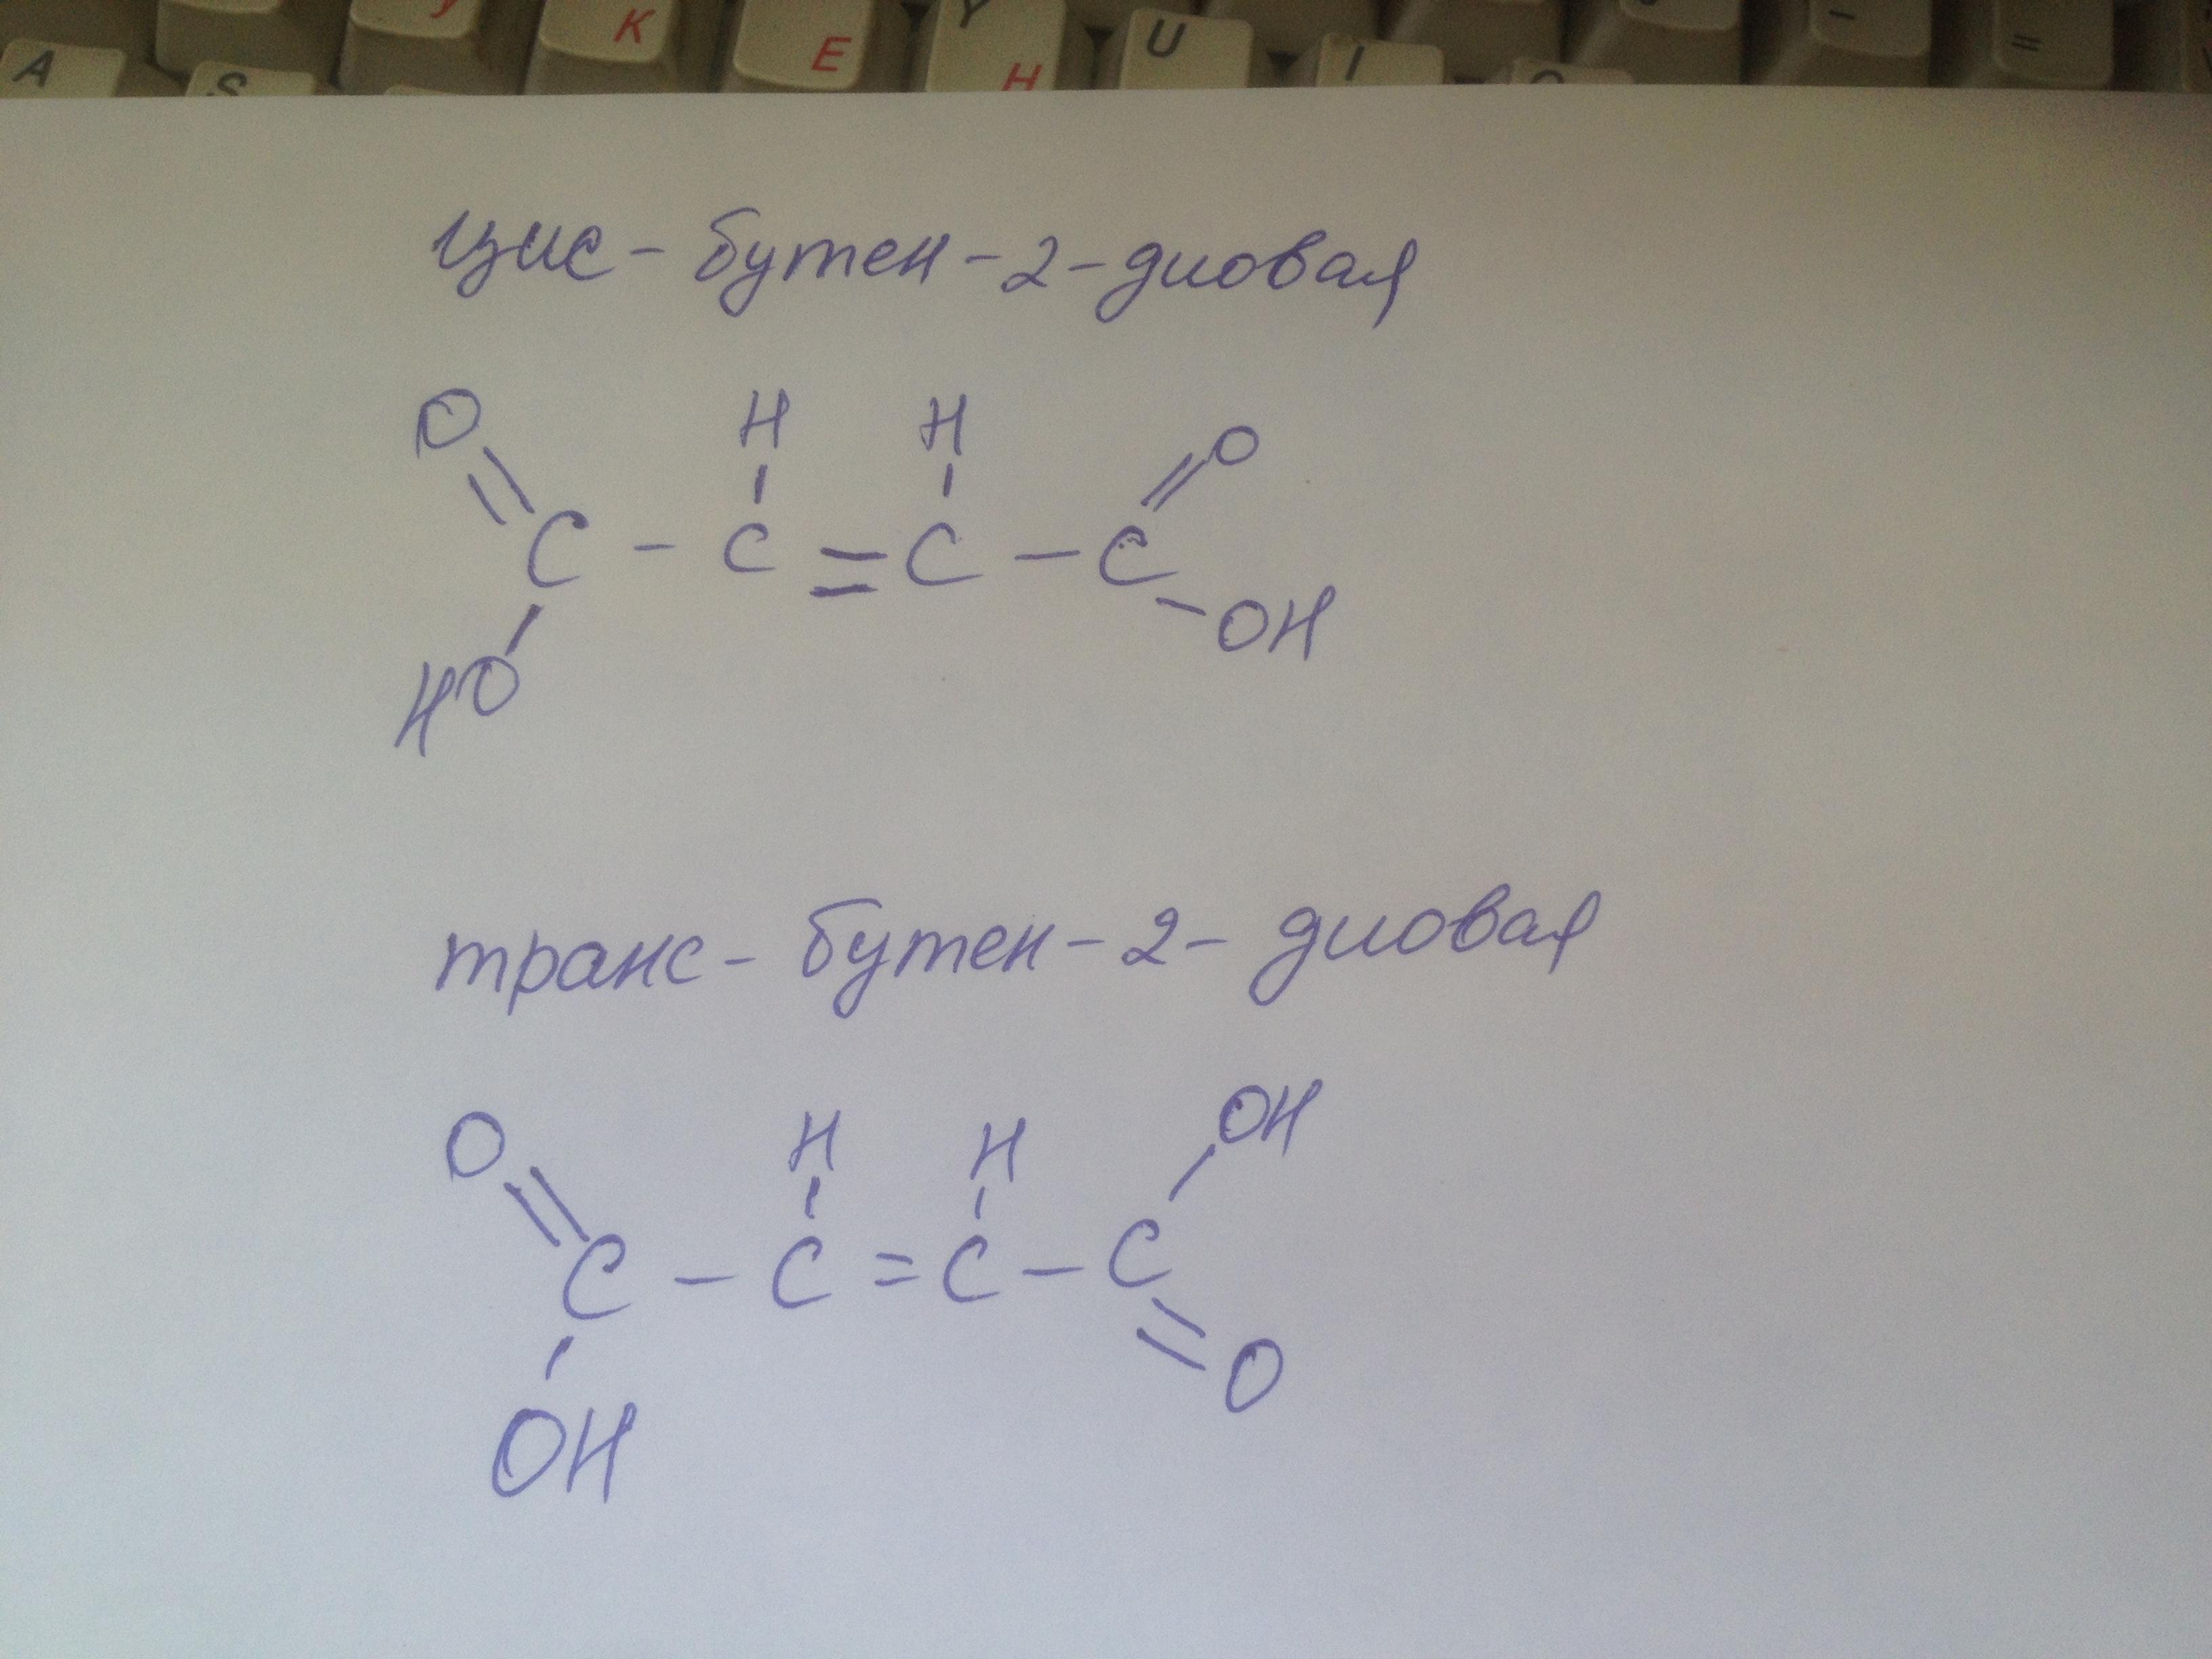 penten-2-tsis-trans-izomeriya